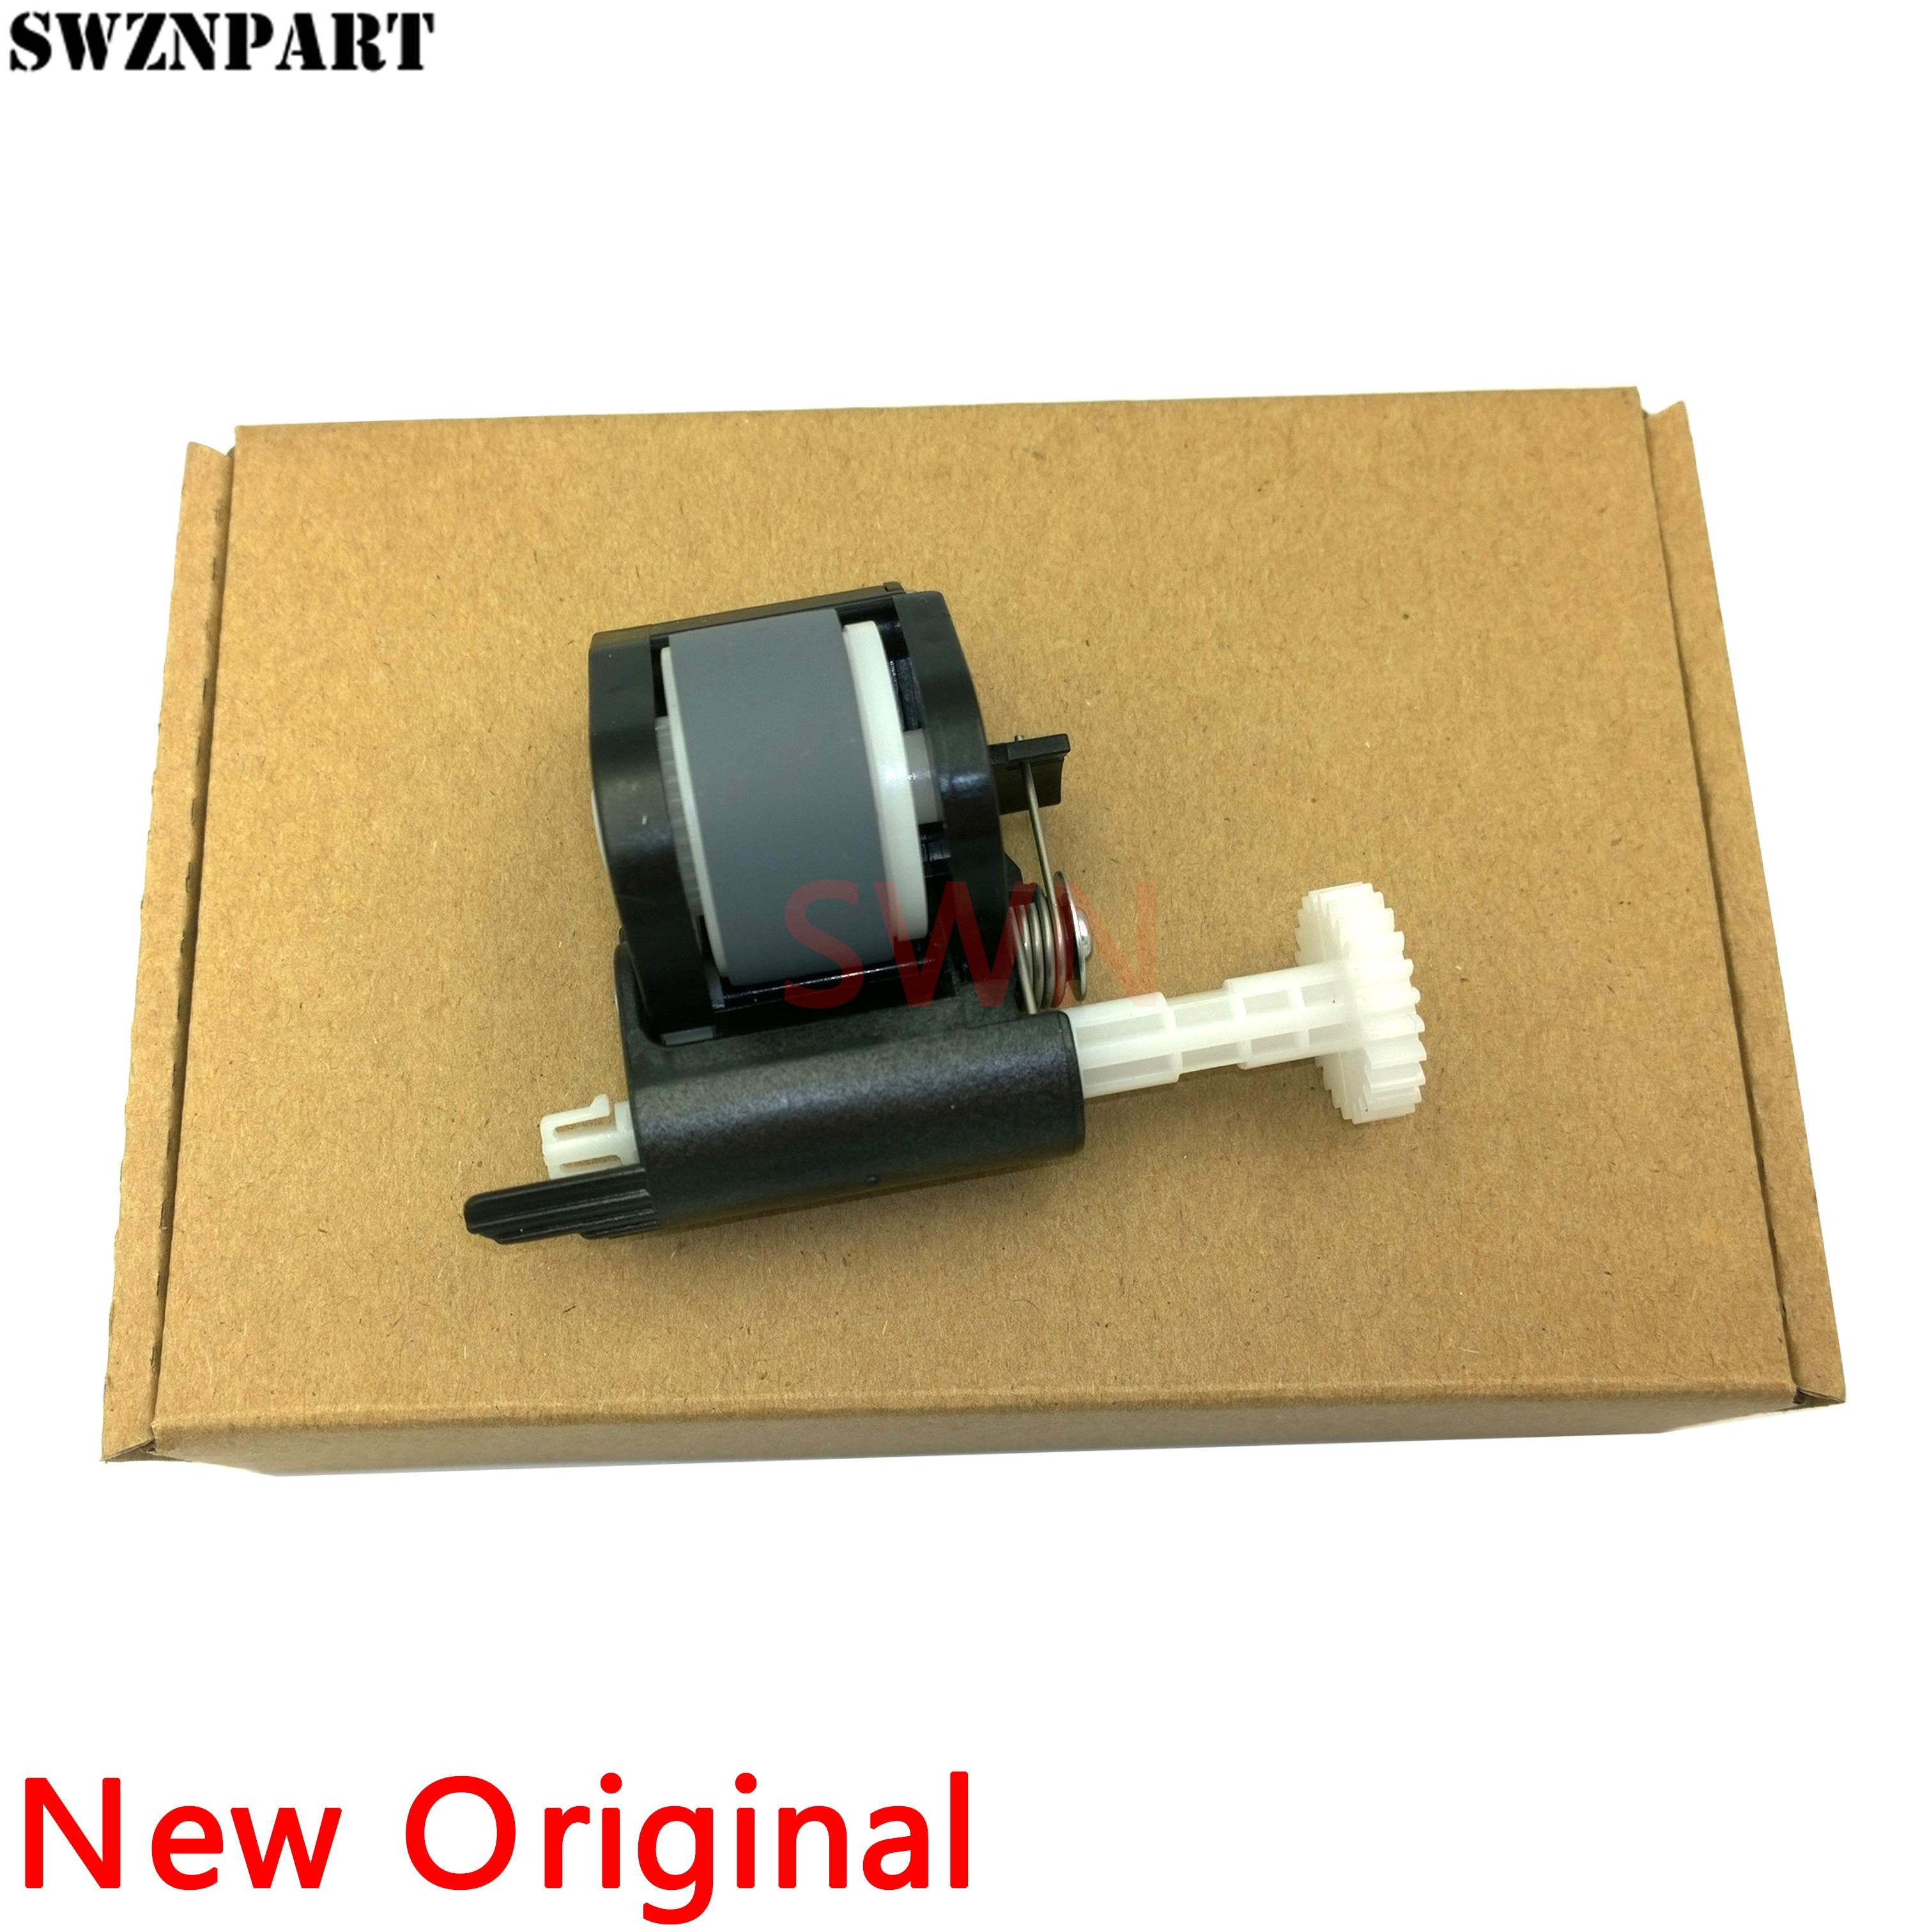 Original New Pickup Roller For Epson L100 L200 L101 L201 T22 TX120 TX130 SX125 S22 SX130 ME330 ME350 ME35 Paper Feed Assembly